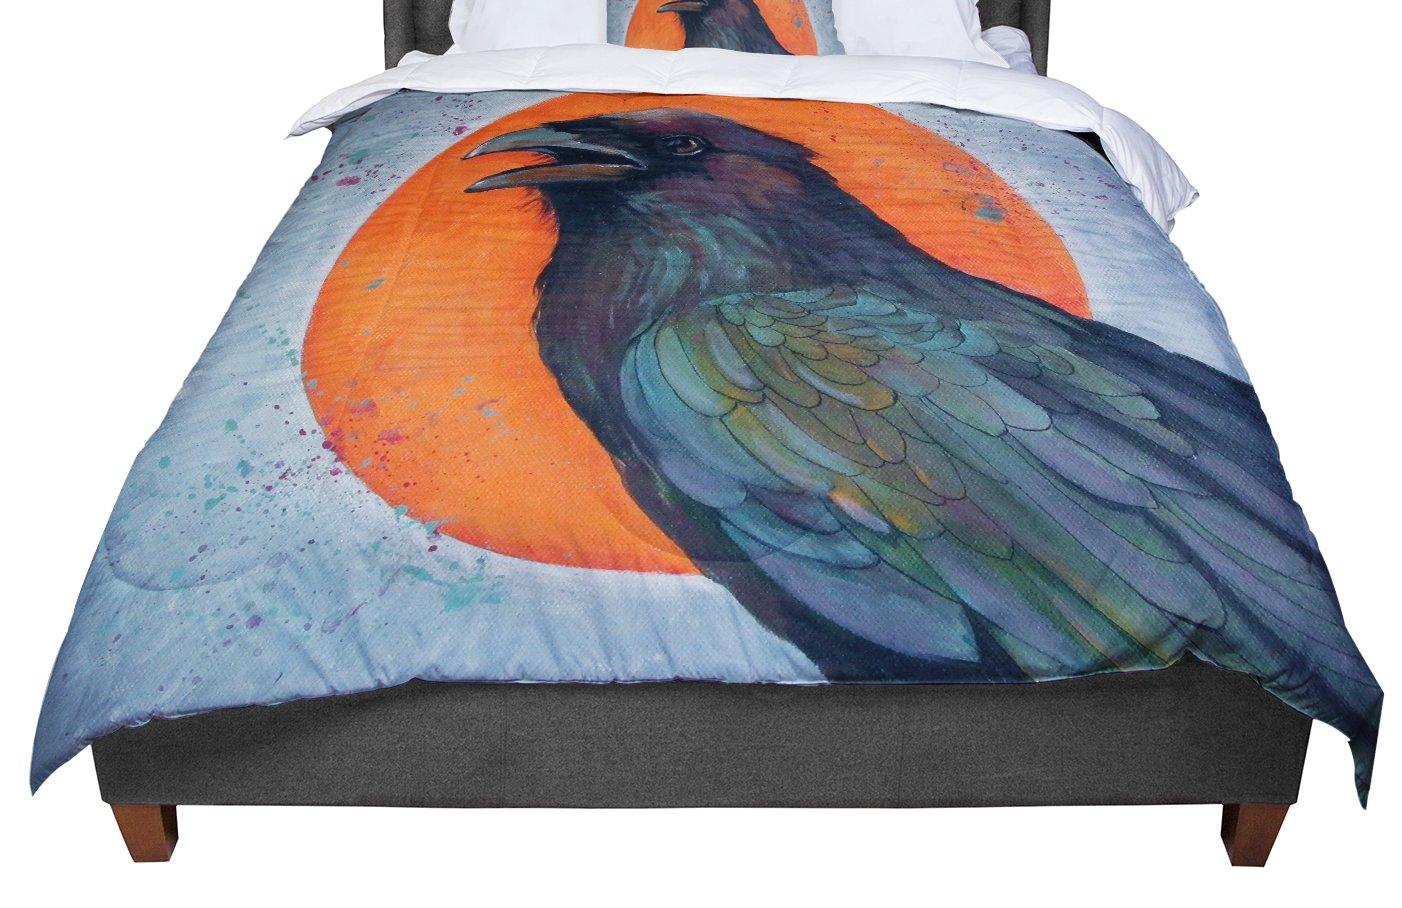 104 X 88 Cal King Comforter KESS InHouse Lydia Martin Raven Sun King